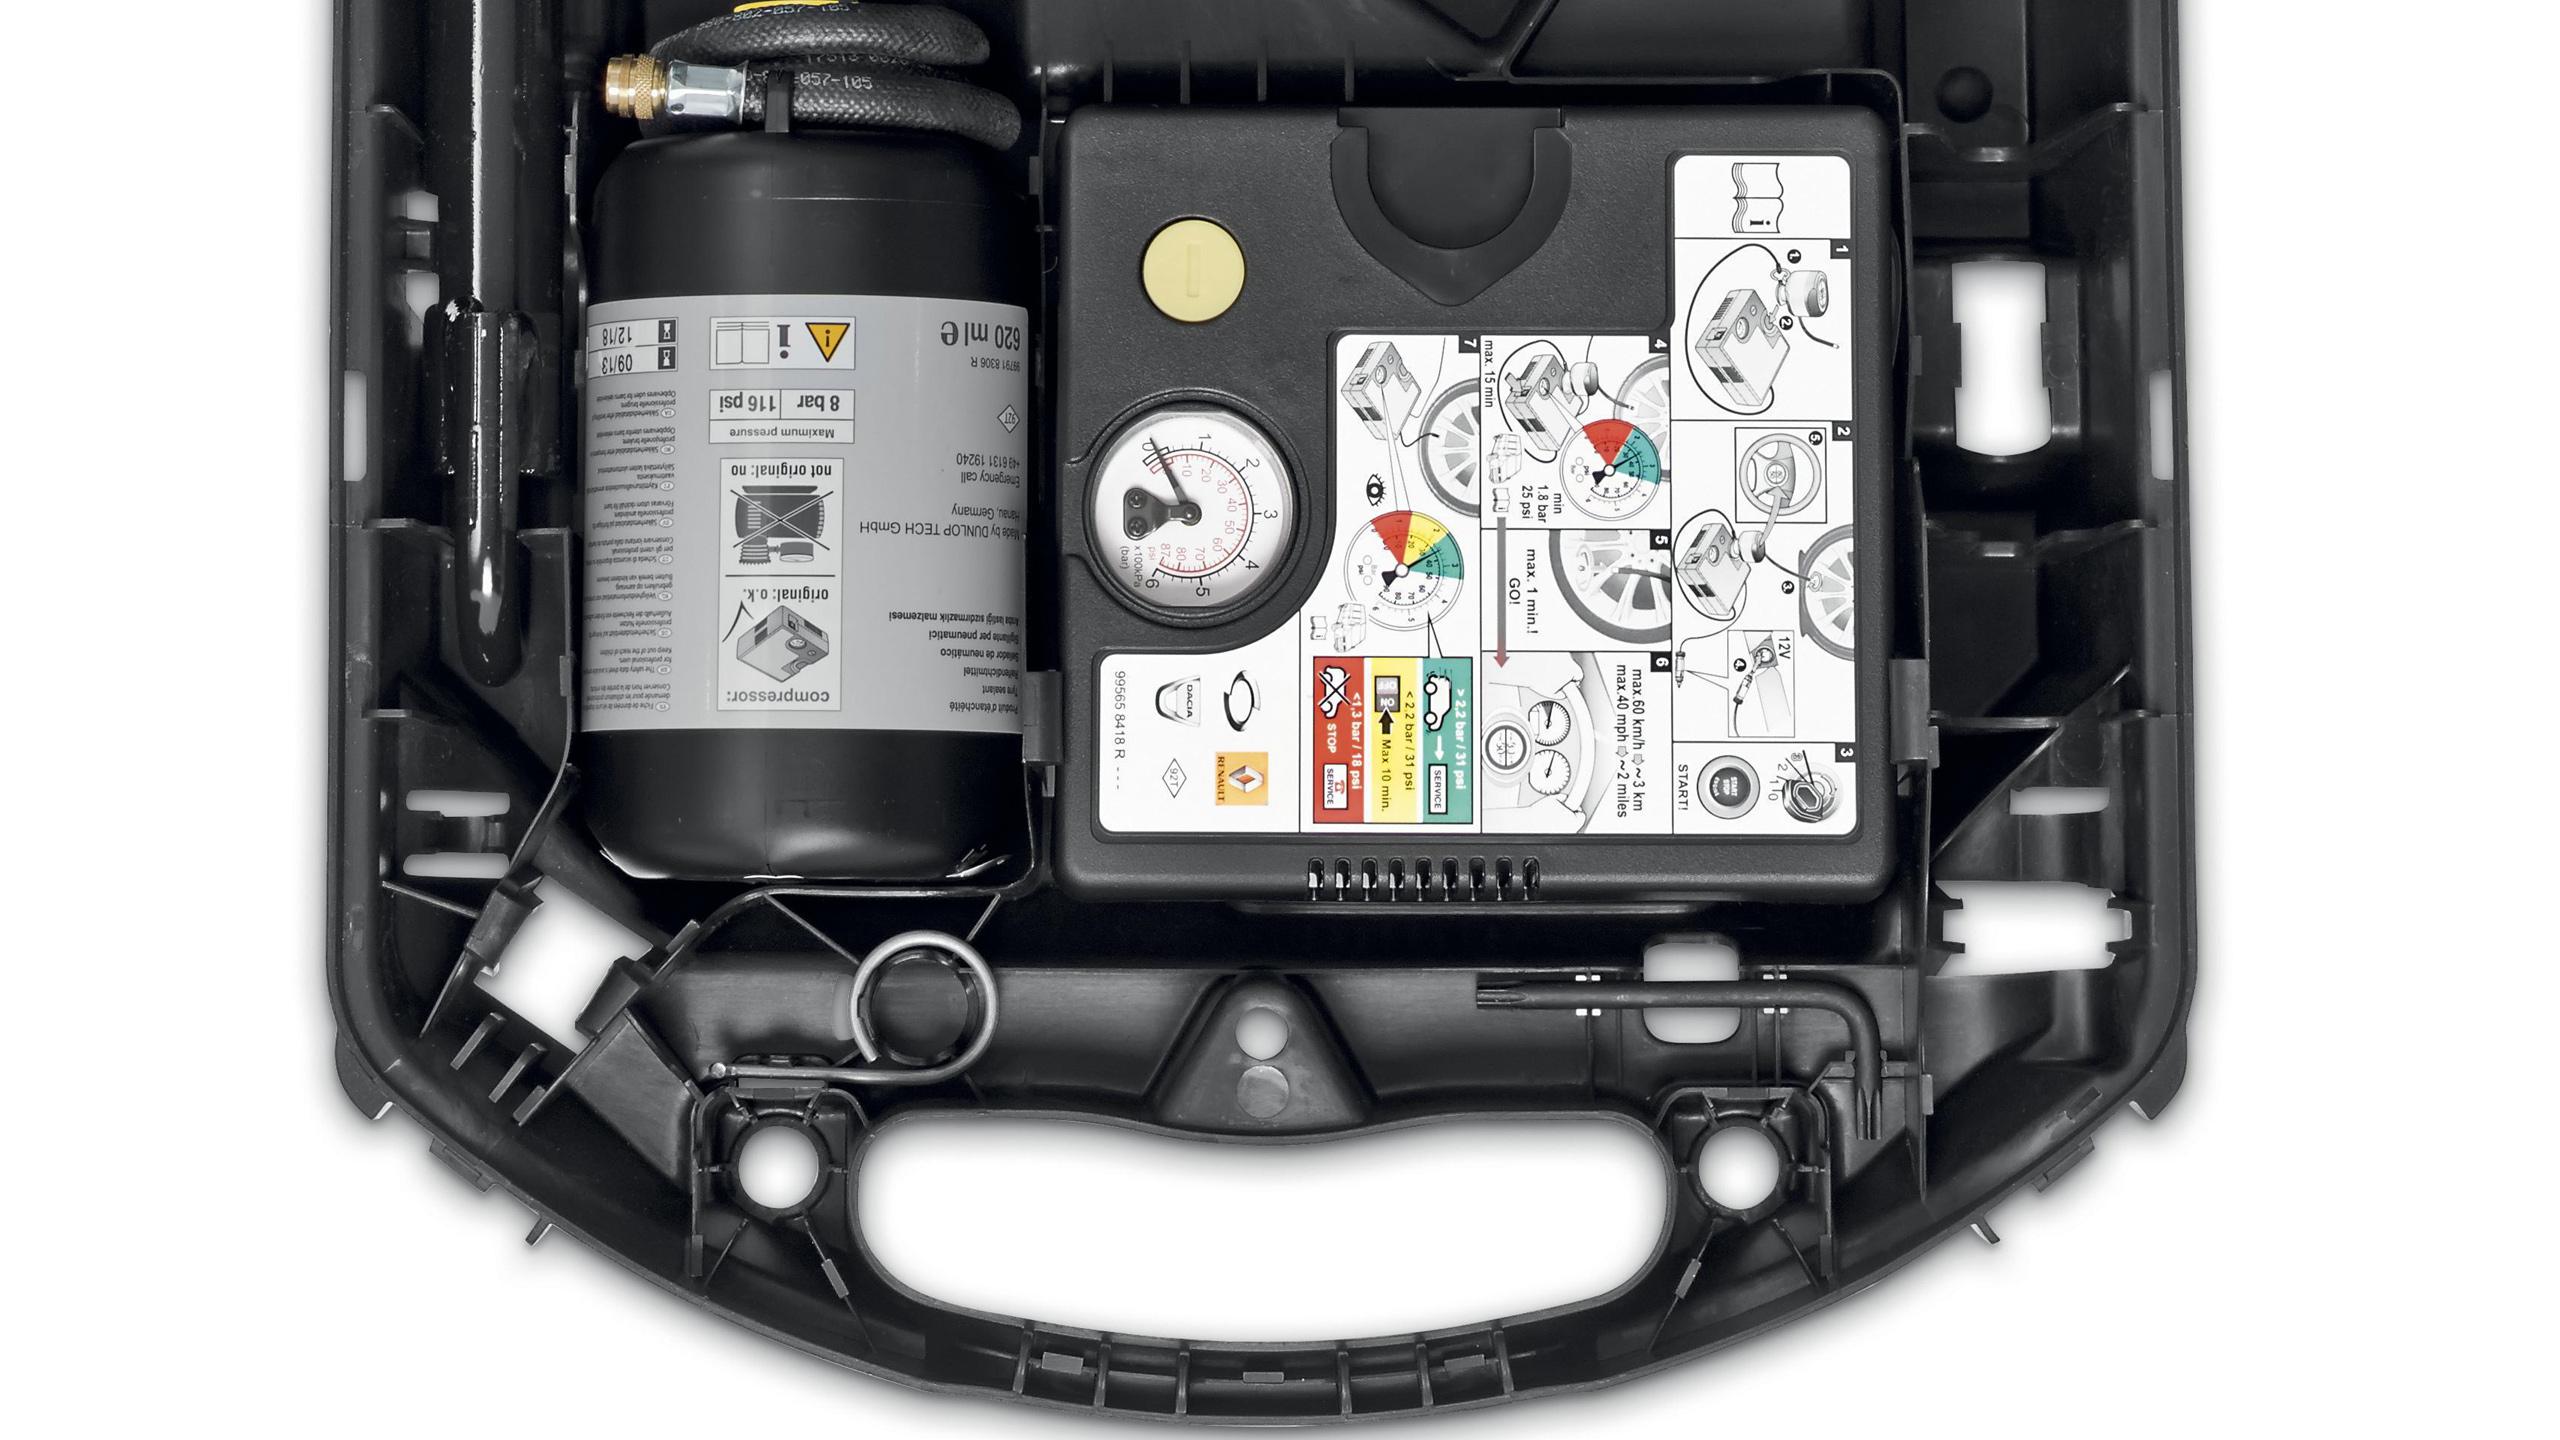 Mobilitäts-Set: Reifendichtmittel, 12-V-Kompressor